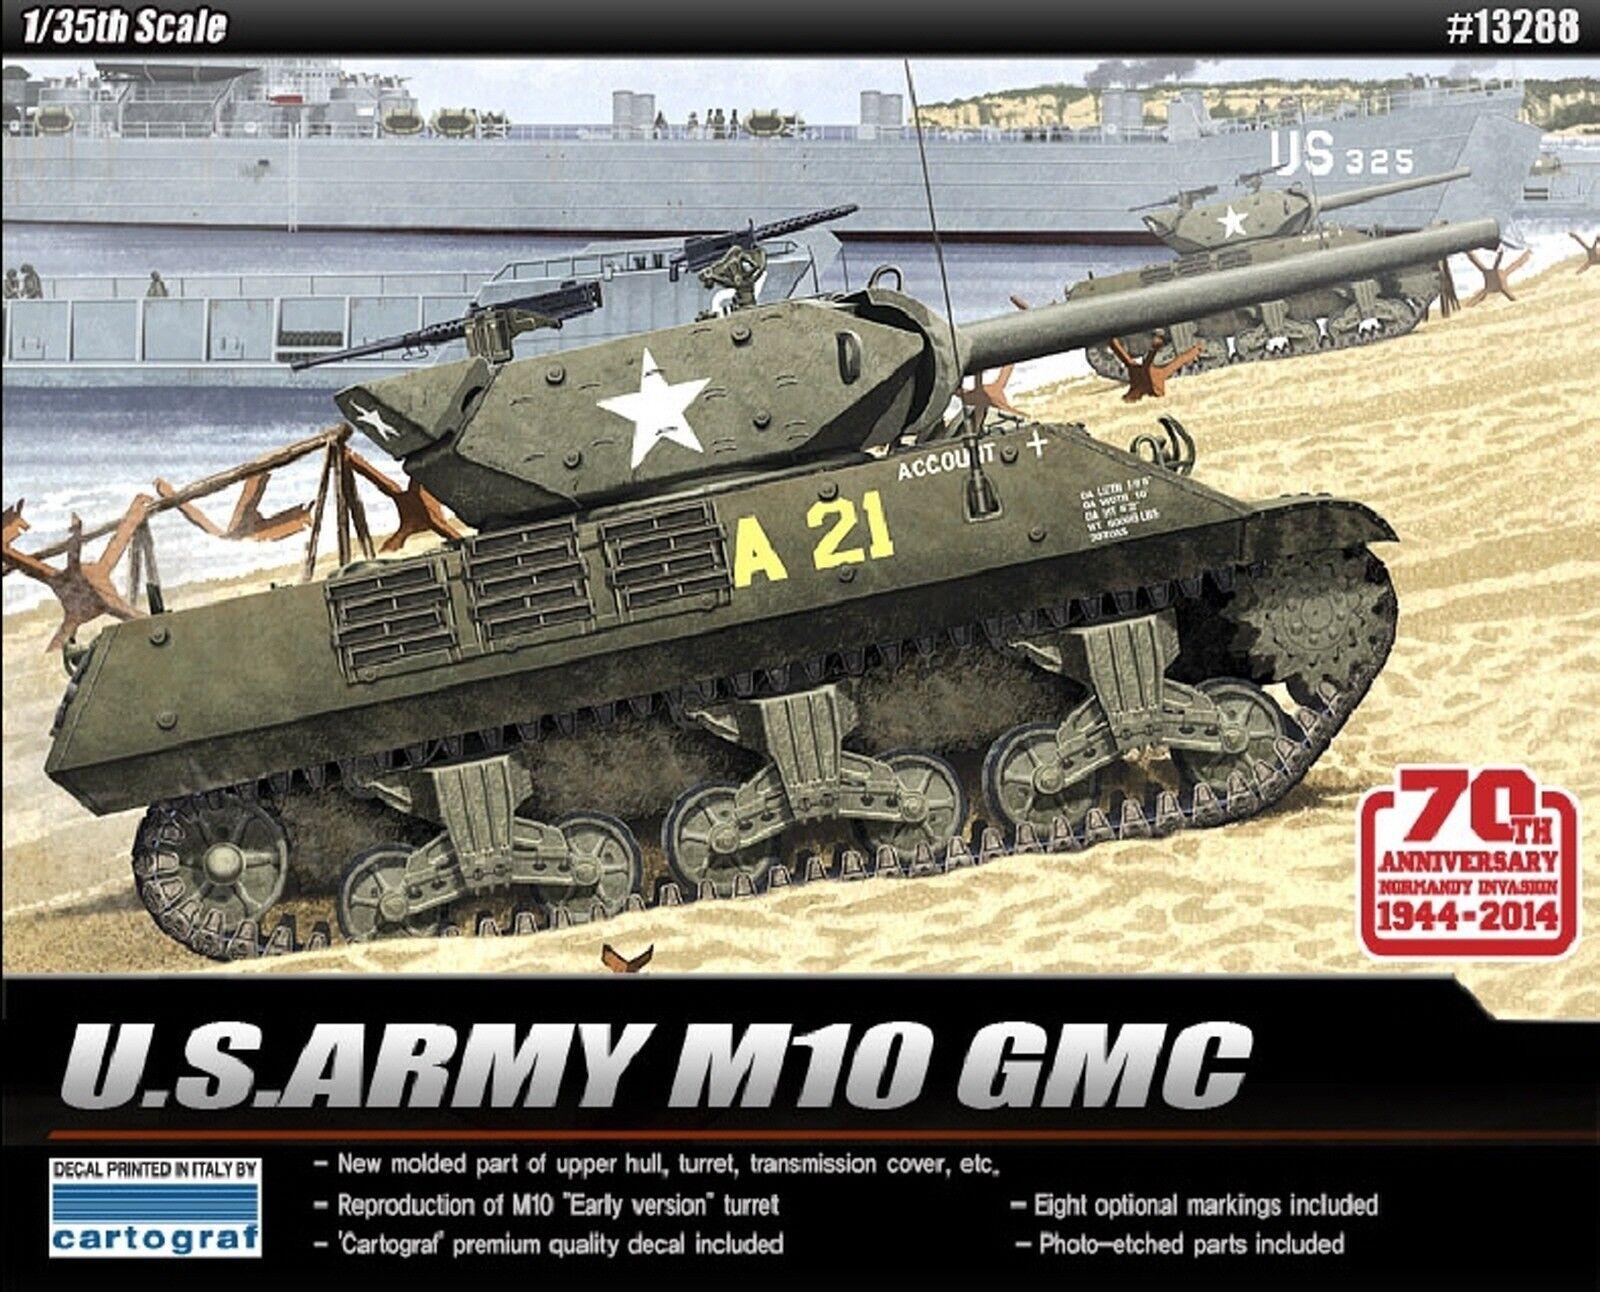 1 35 U.S Army M10 GMC